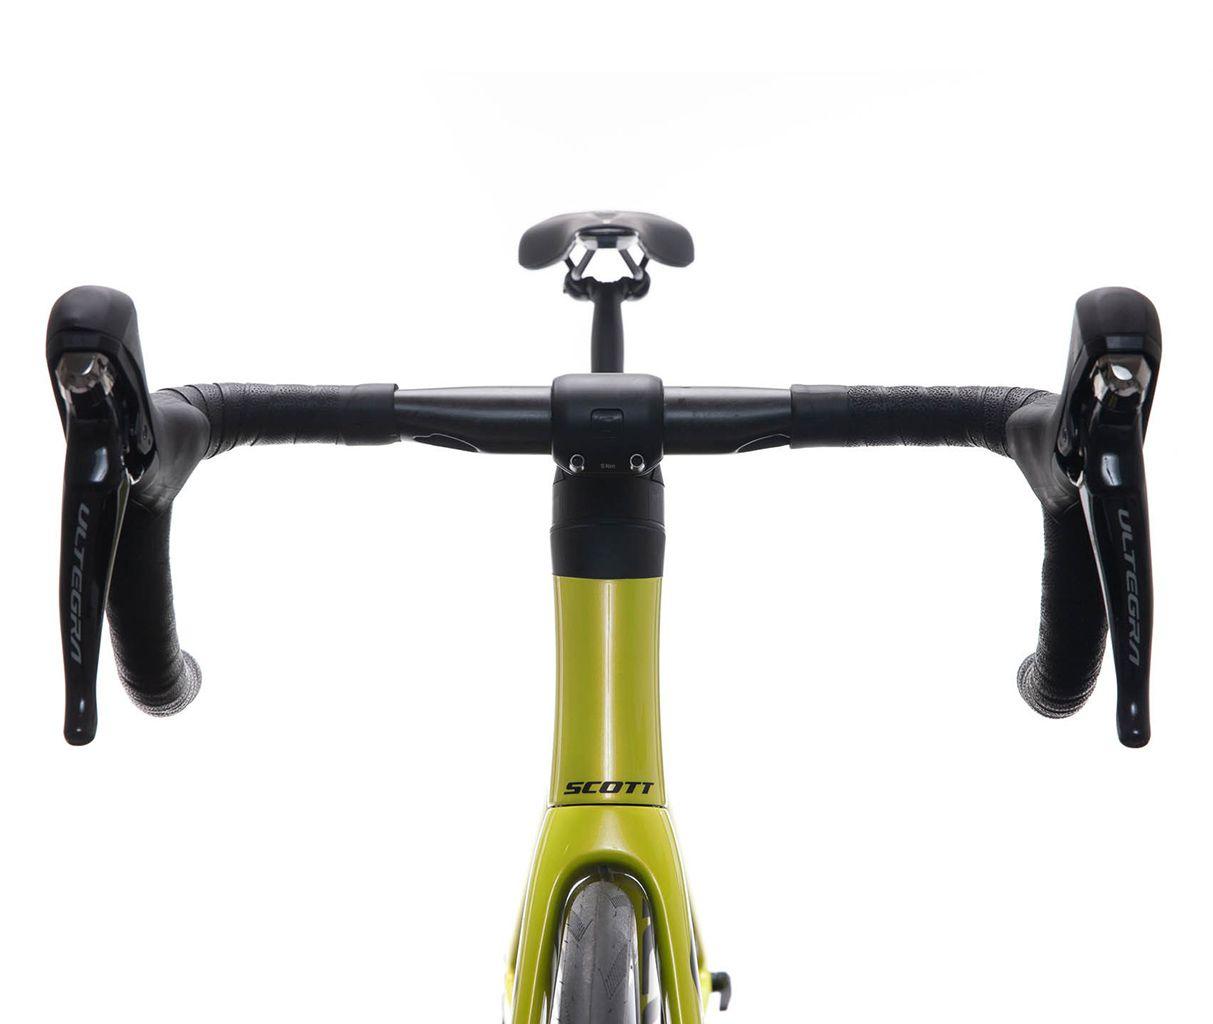 Bici strada Bicicletta Scott Addict RC 30 Yellow